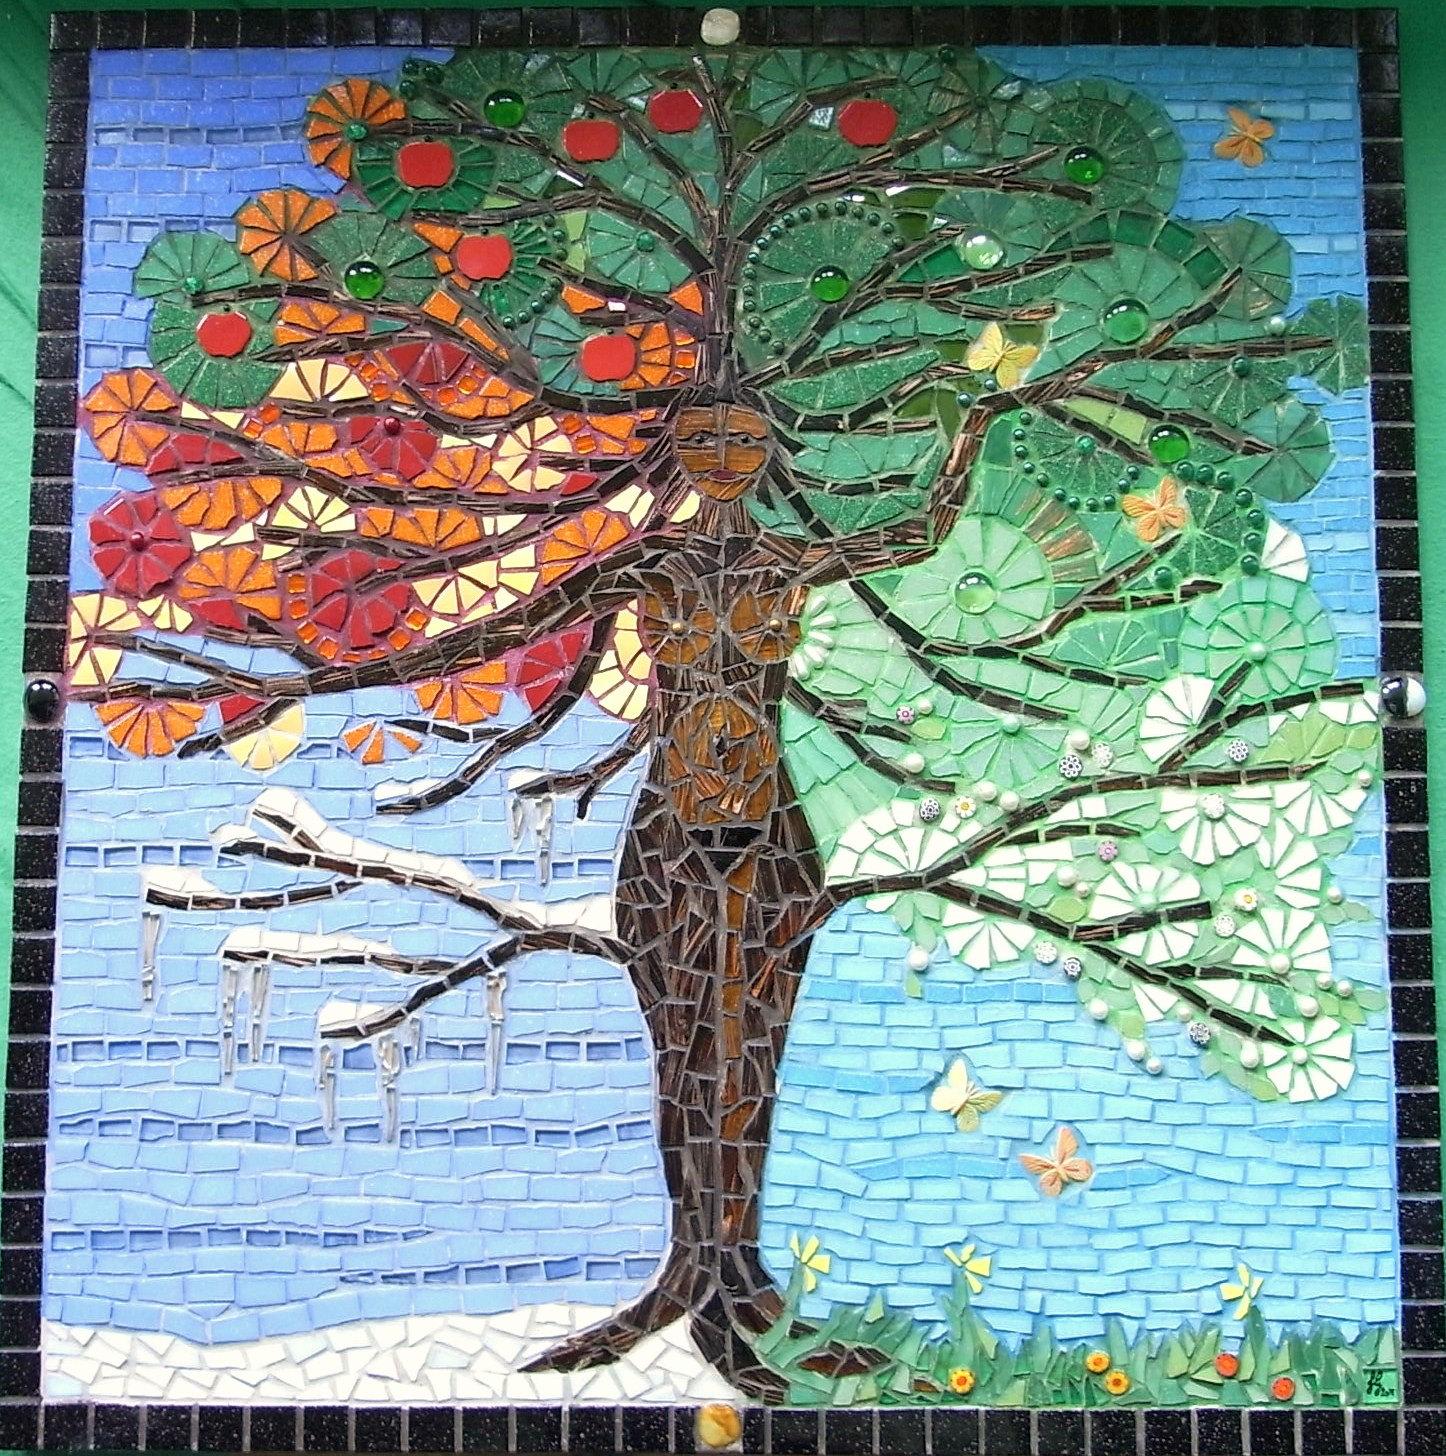 piecemaker mosaic artists tree of life